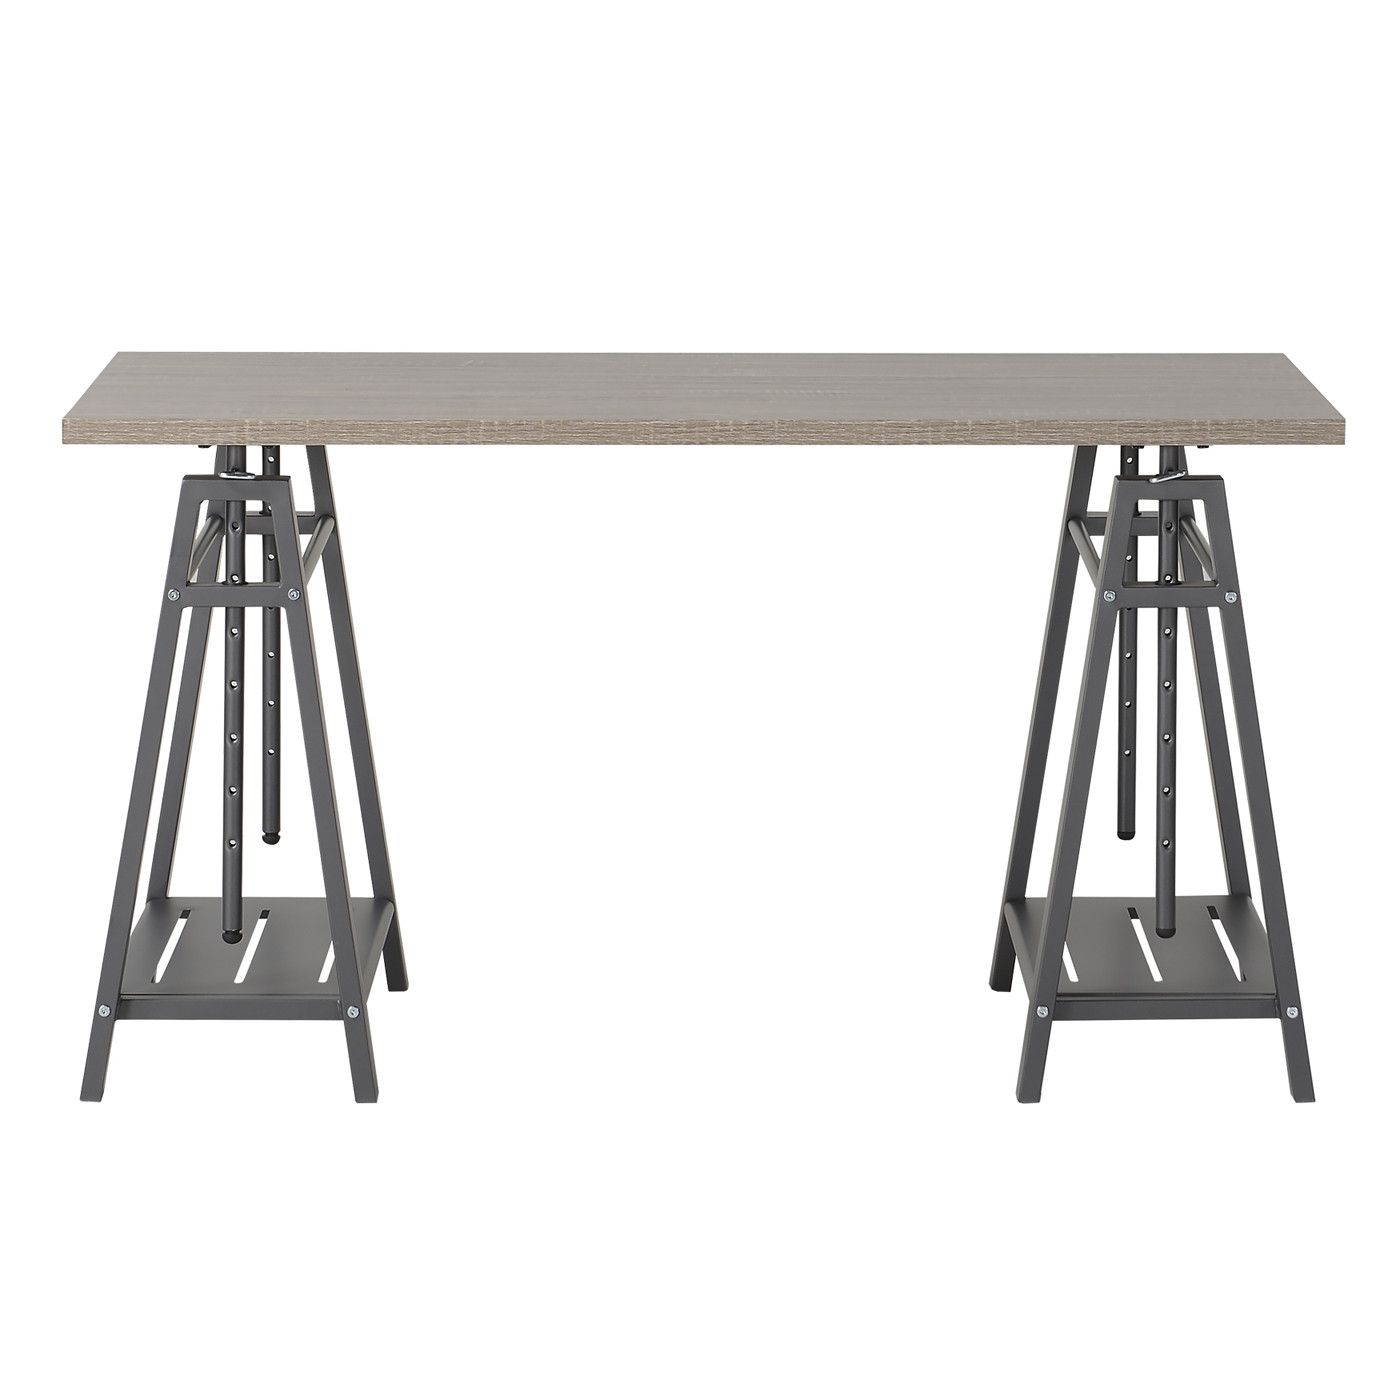 Homestar Height Adjustable Writing Desk